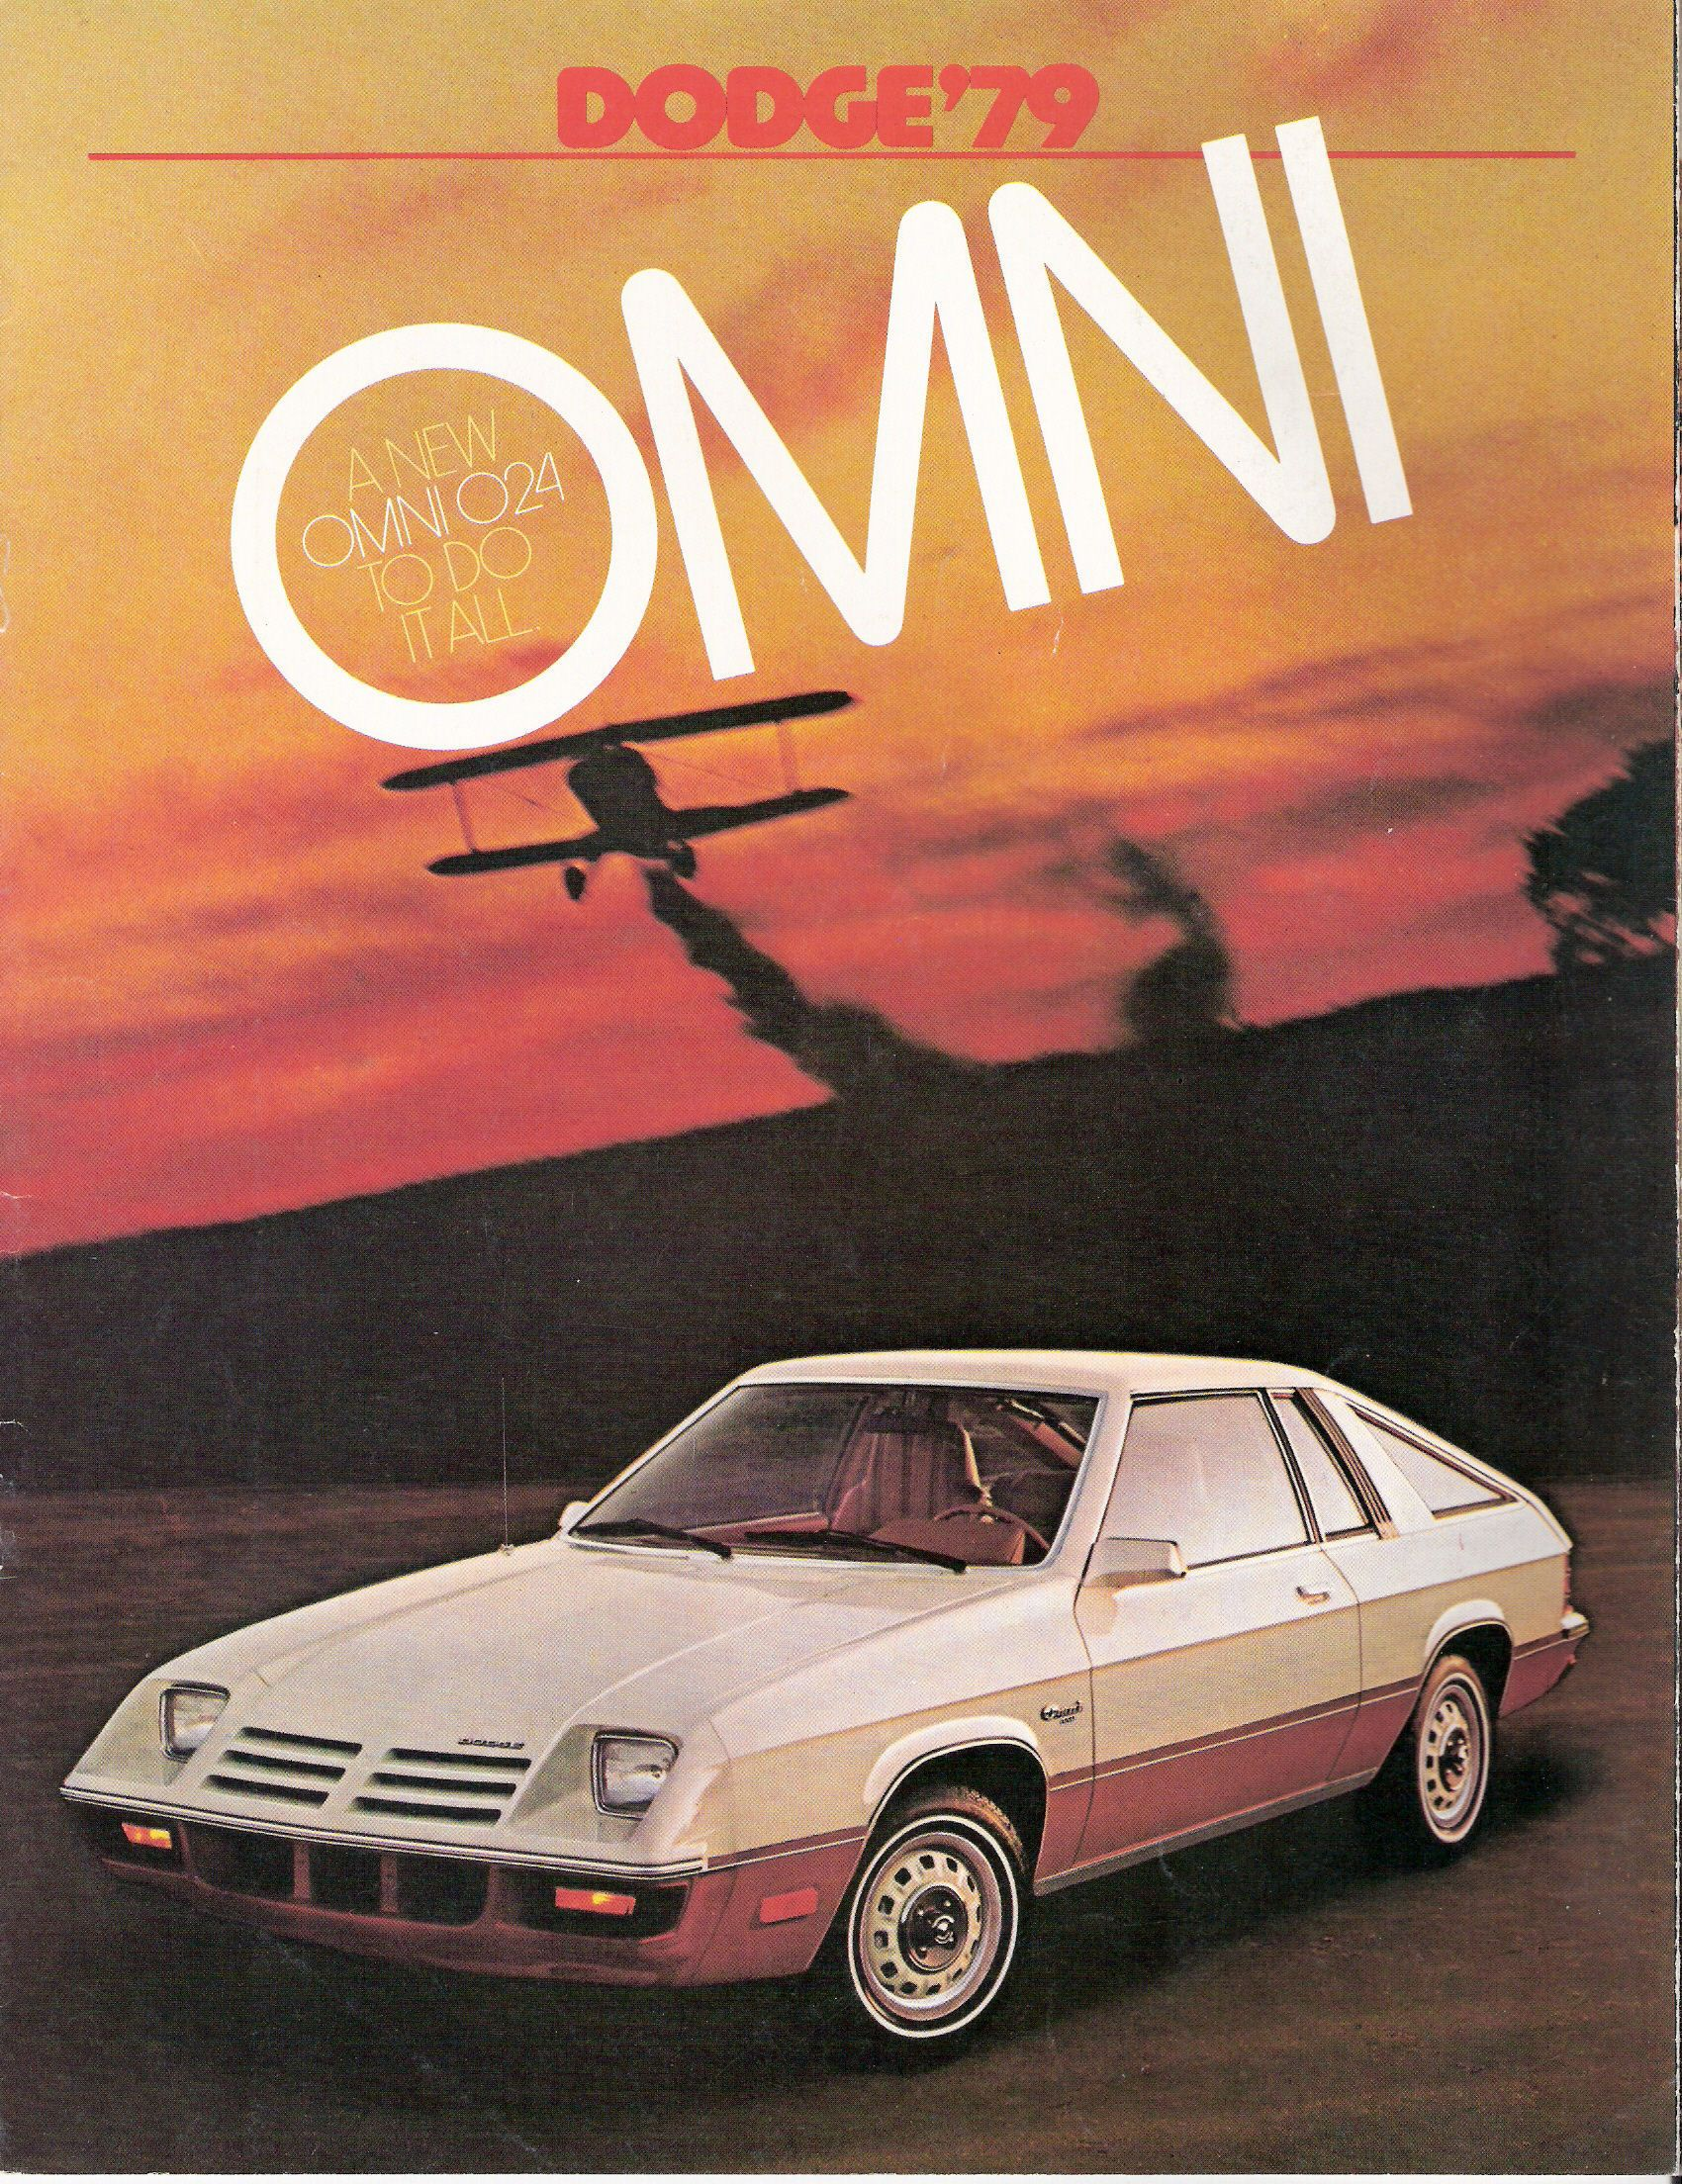 Pin by Quint ausbrooks on Vintage auto ads | Pinterest | Cars